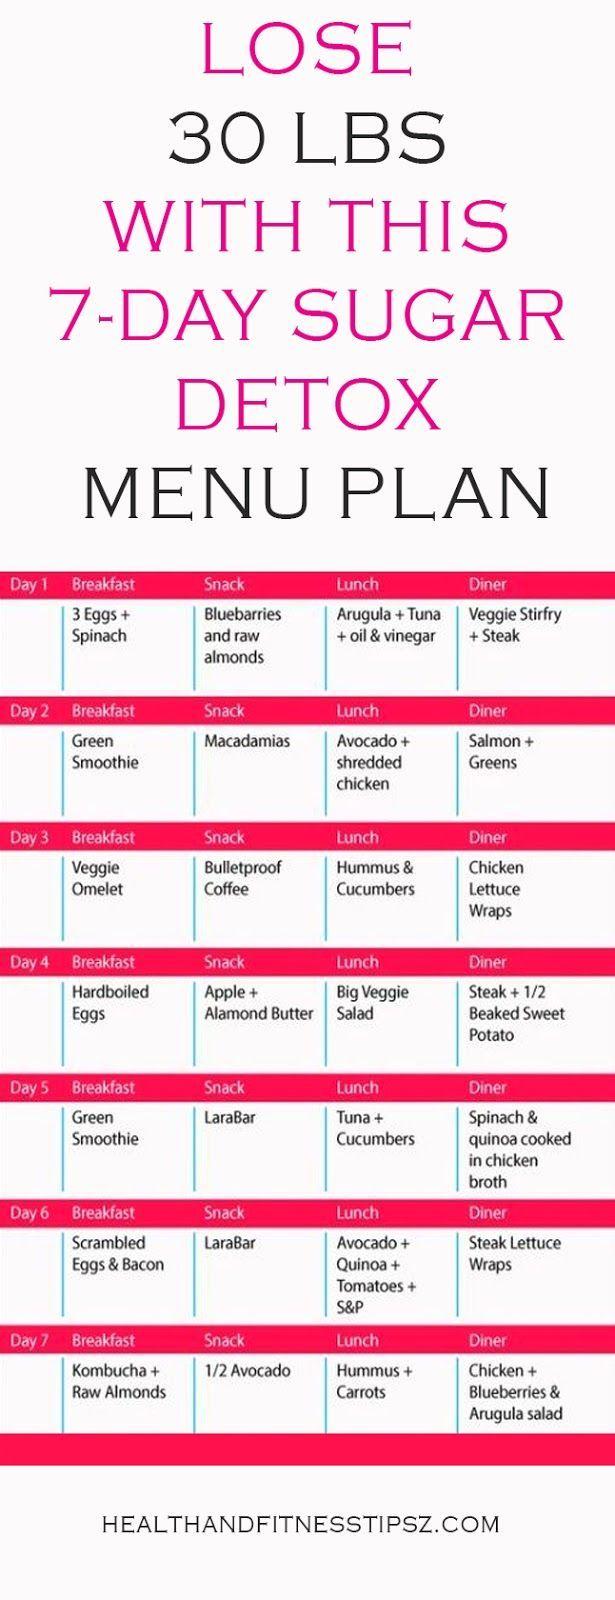 LOSE 30 LBS WITH THIS 7DAY SUGAR DETOX MENU PLAN  Free Health Tips